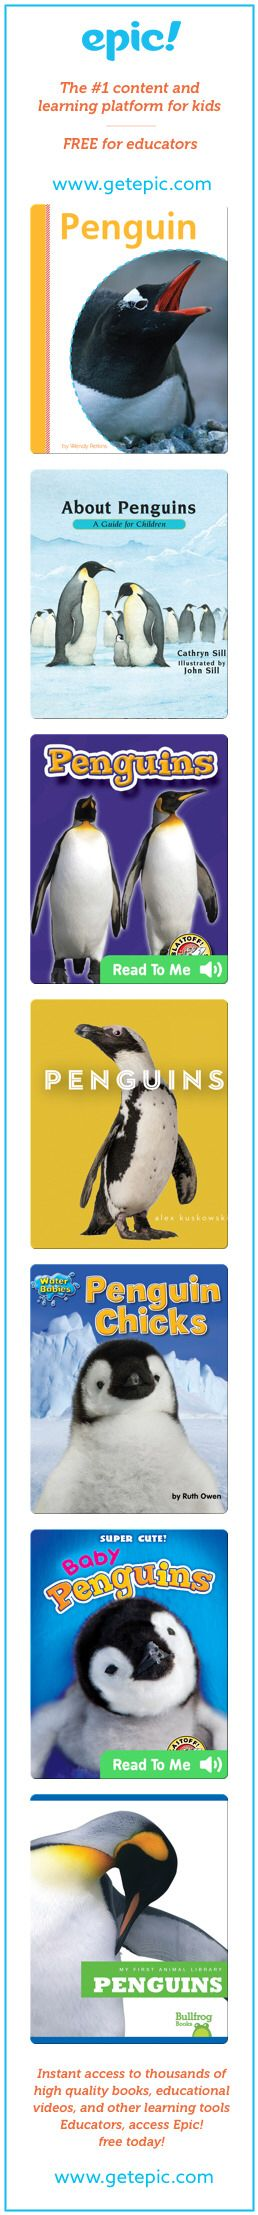 Penguins - All about penguins